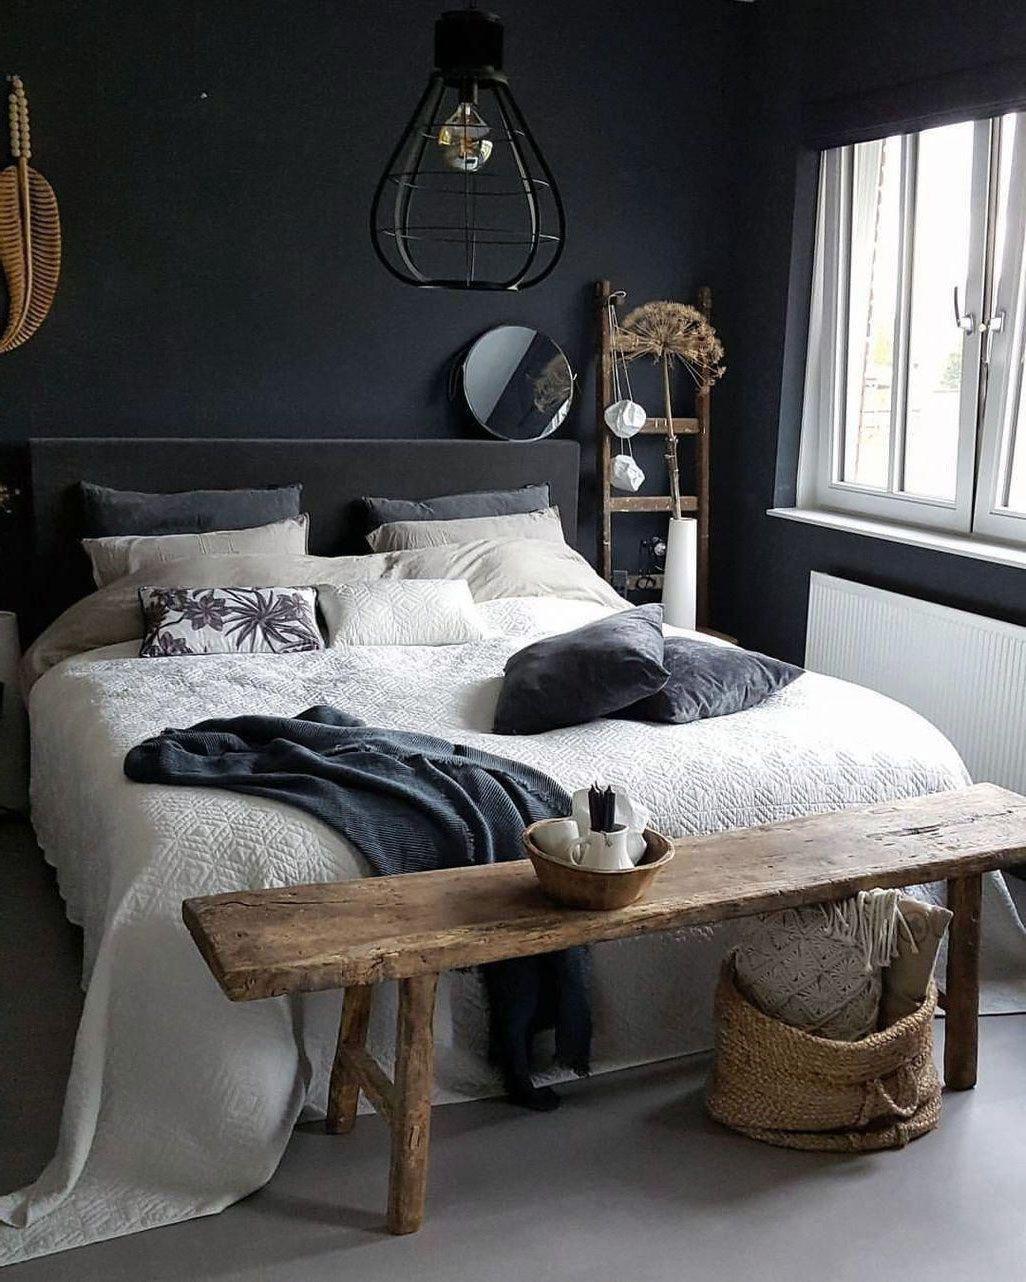 24 Dark Scheme For Scandinavian Interior Bedroom Have More Astonishing 24 Dark Schem Be In 2020 Scandinavian Interior Bedroom Bedroom Interior Mens Bedroom Decor